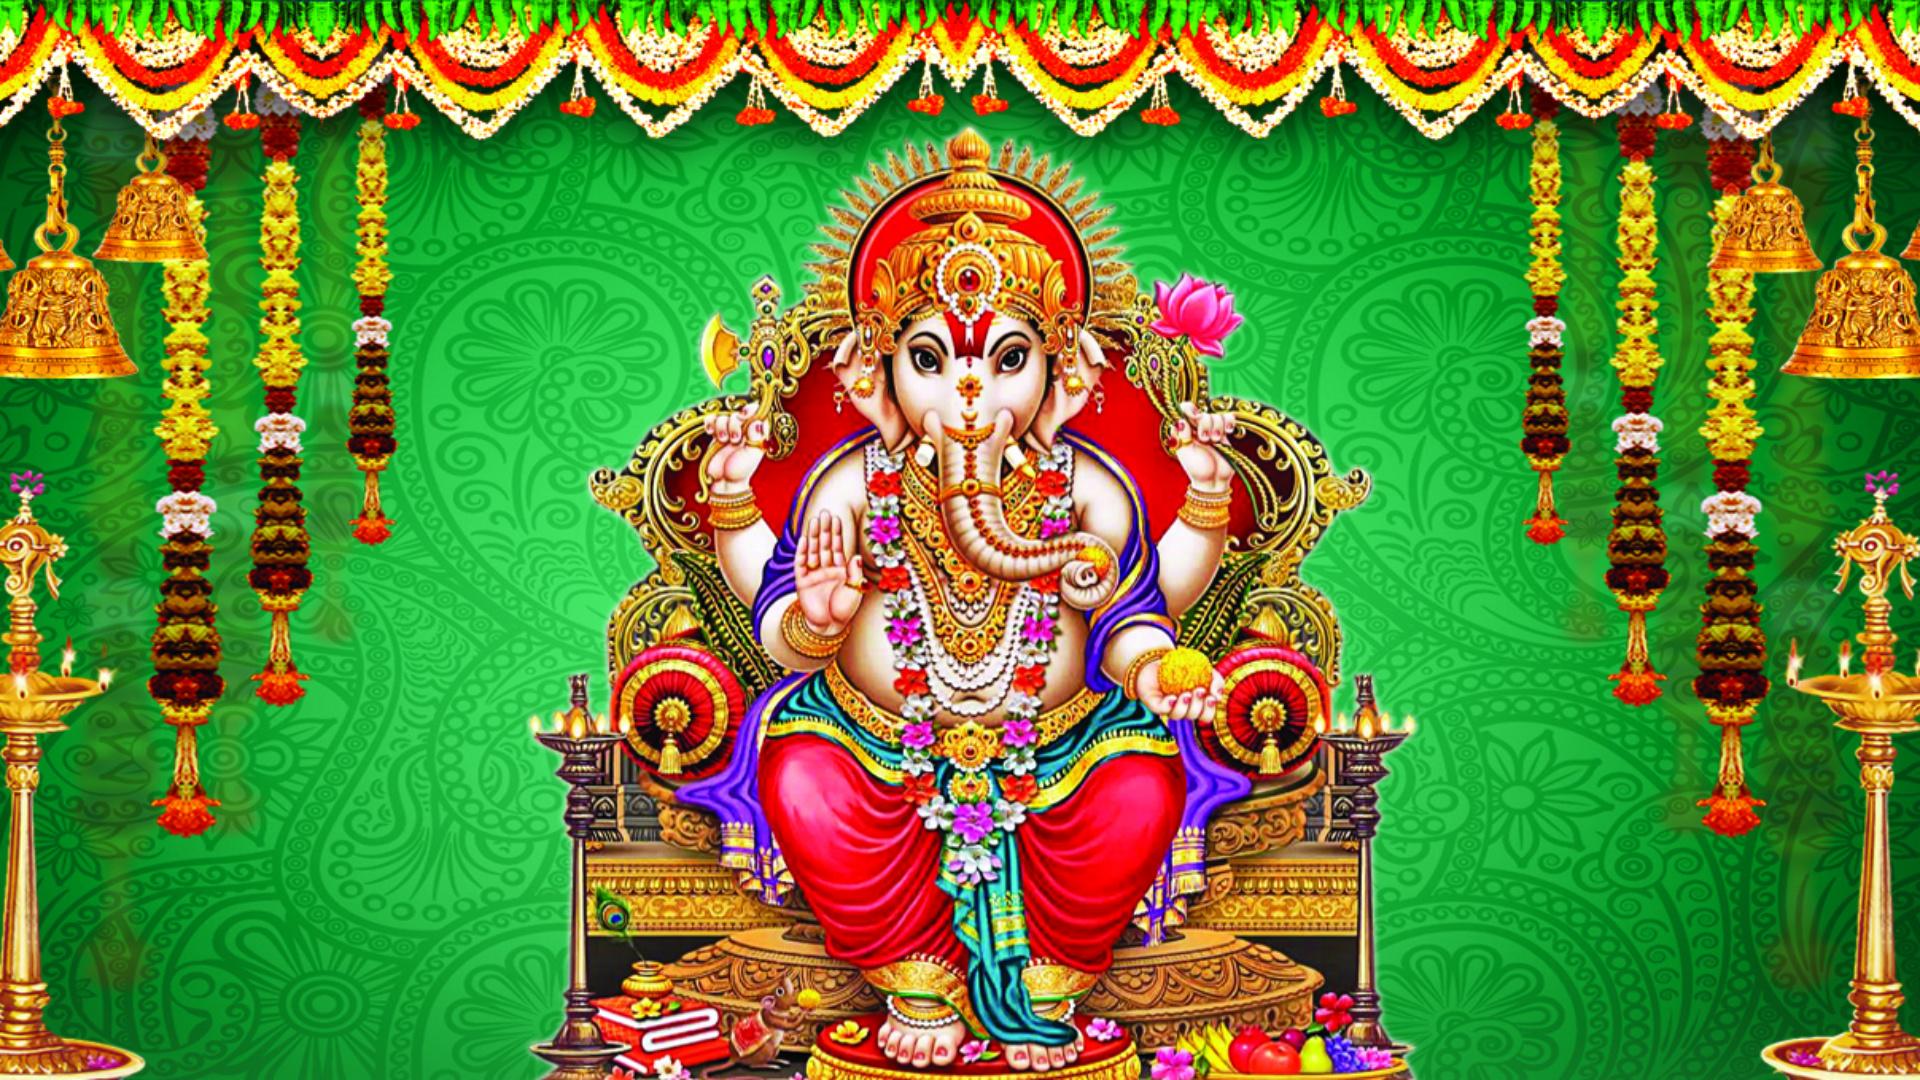 Lambodara Sankashti Chaturthi 2020 Date and Shubh Muhurat: Puja Tithi, Vrat Vidhi and Significance of the Lord Ganesha Festival